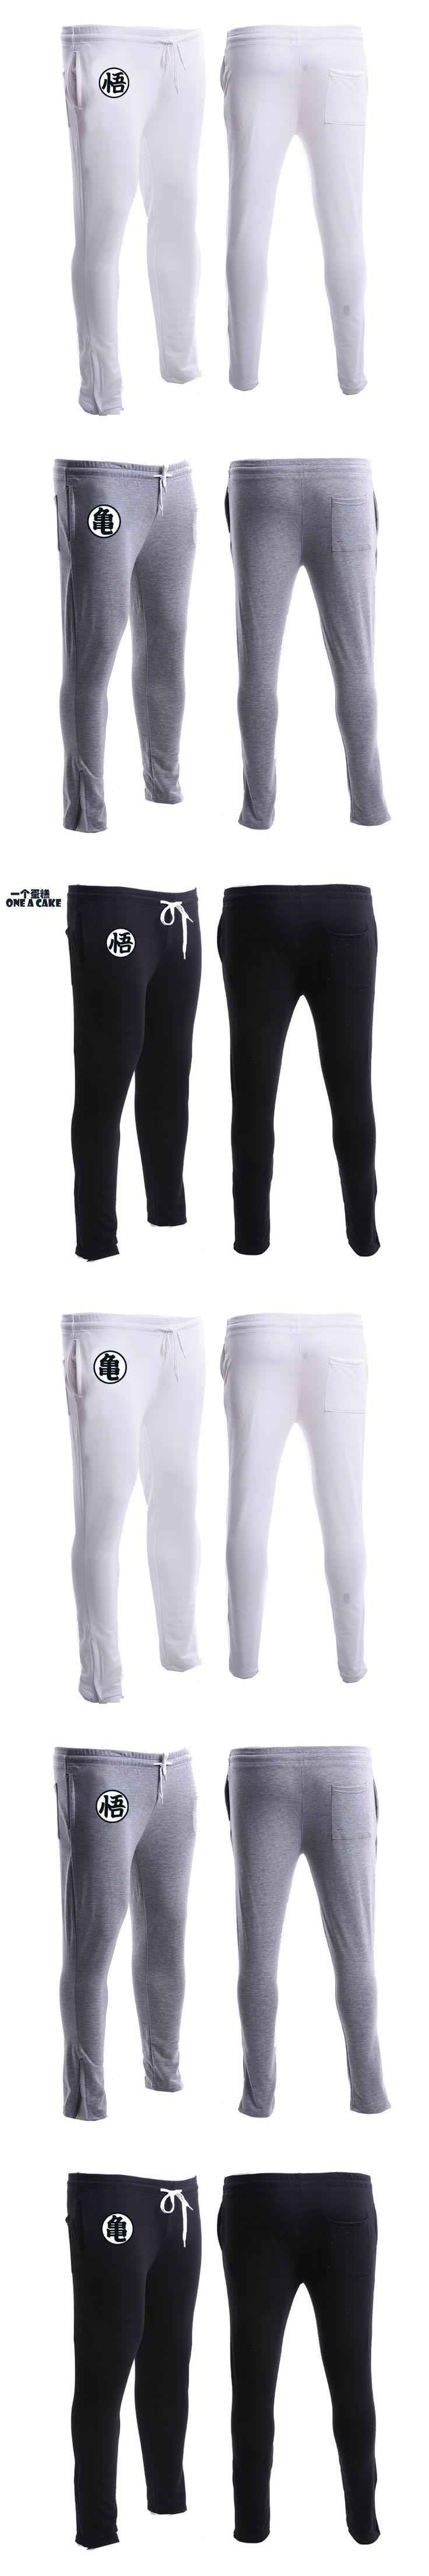 Jogger Pants Men Fitness Bodybuilding Golds Gyms Clothing Anime Dragon Ball Z GOKU Sweatpants Men Brand Casual Pure cotton